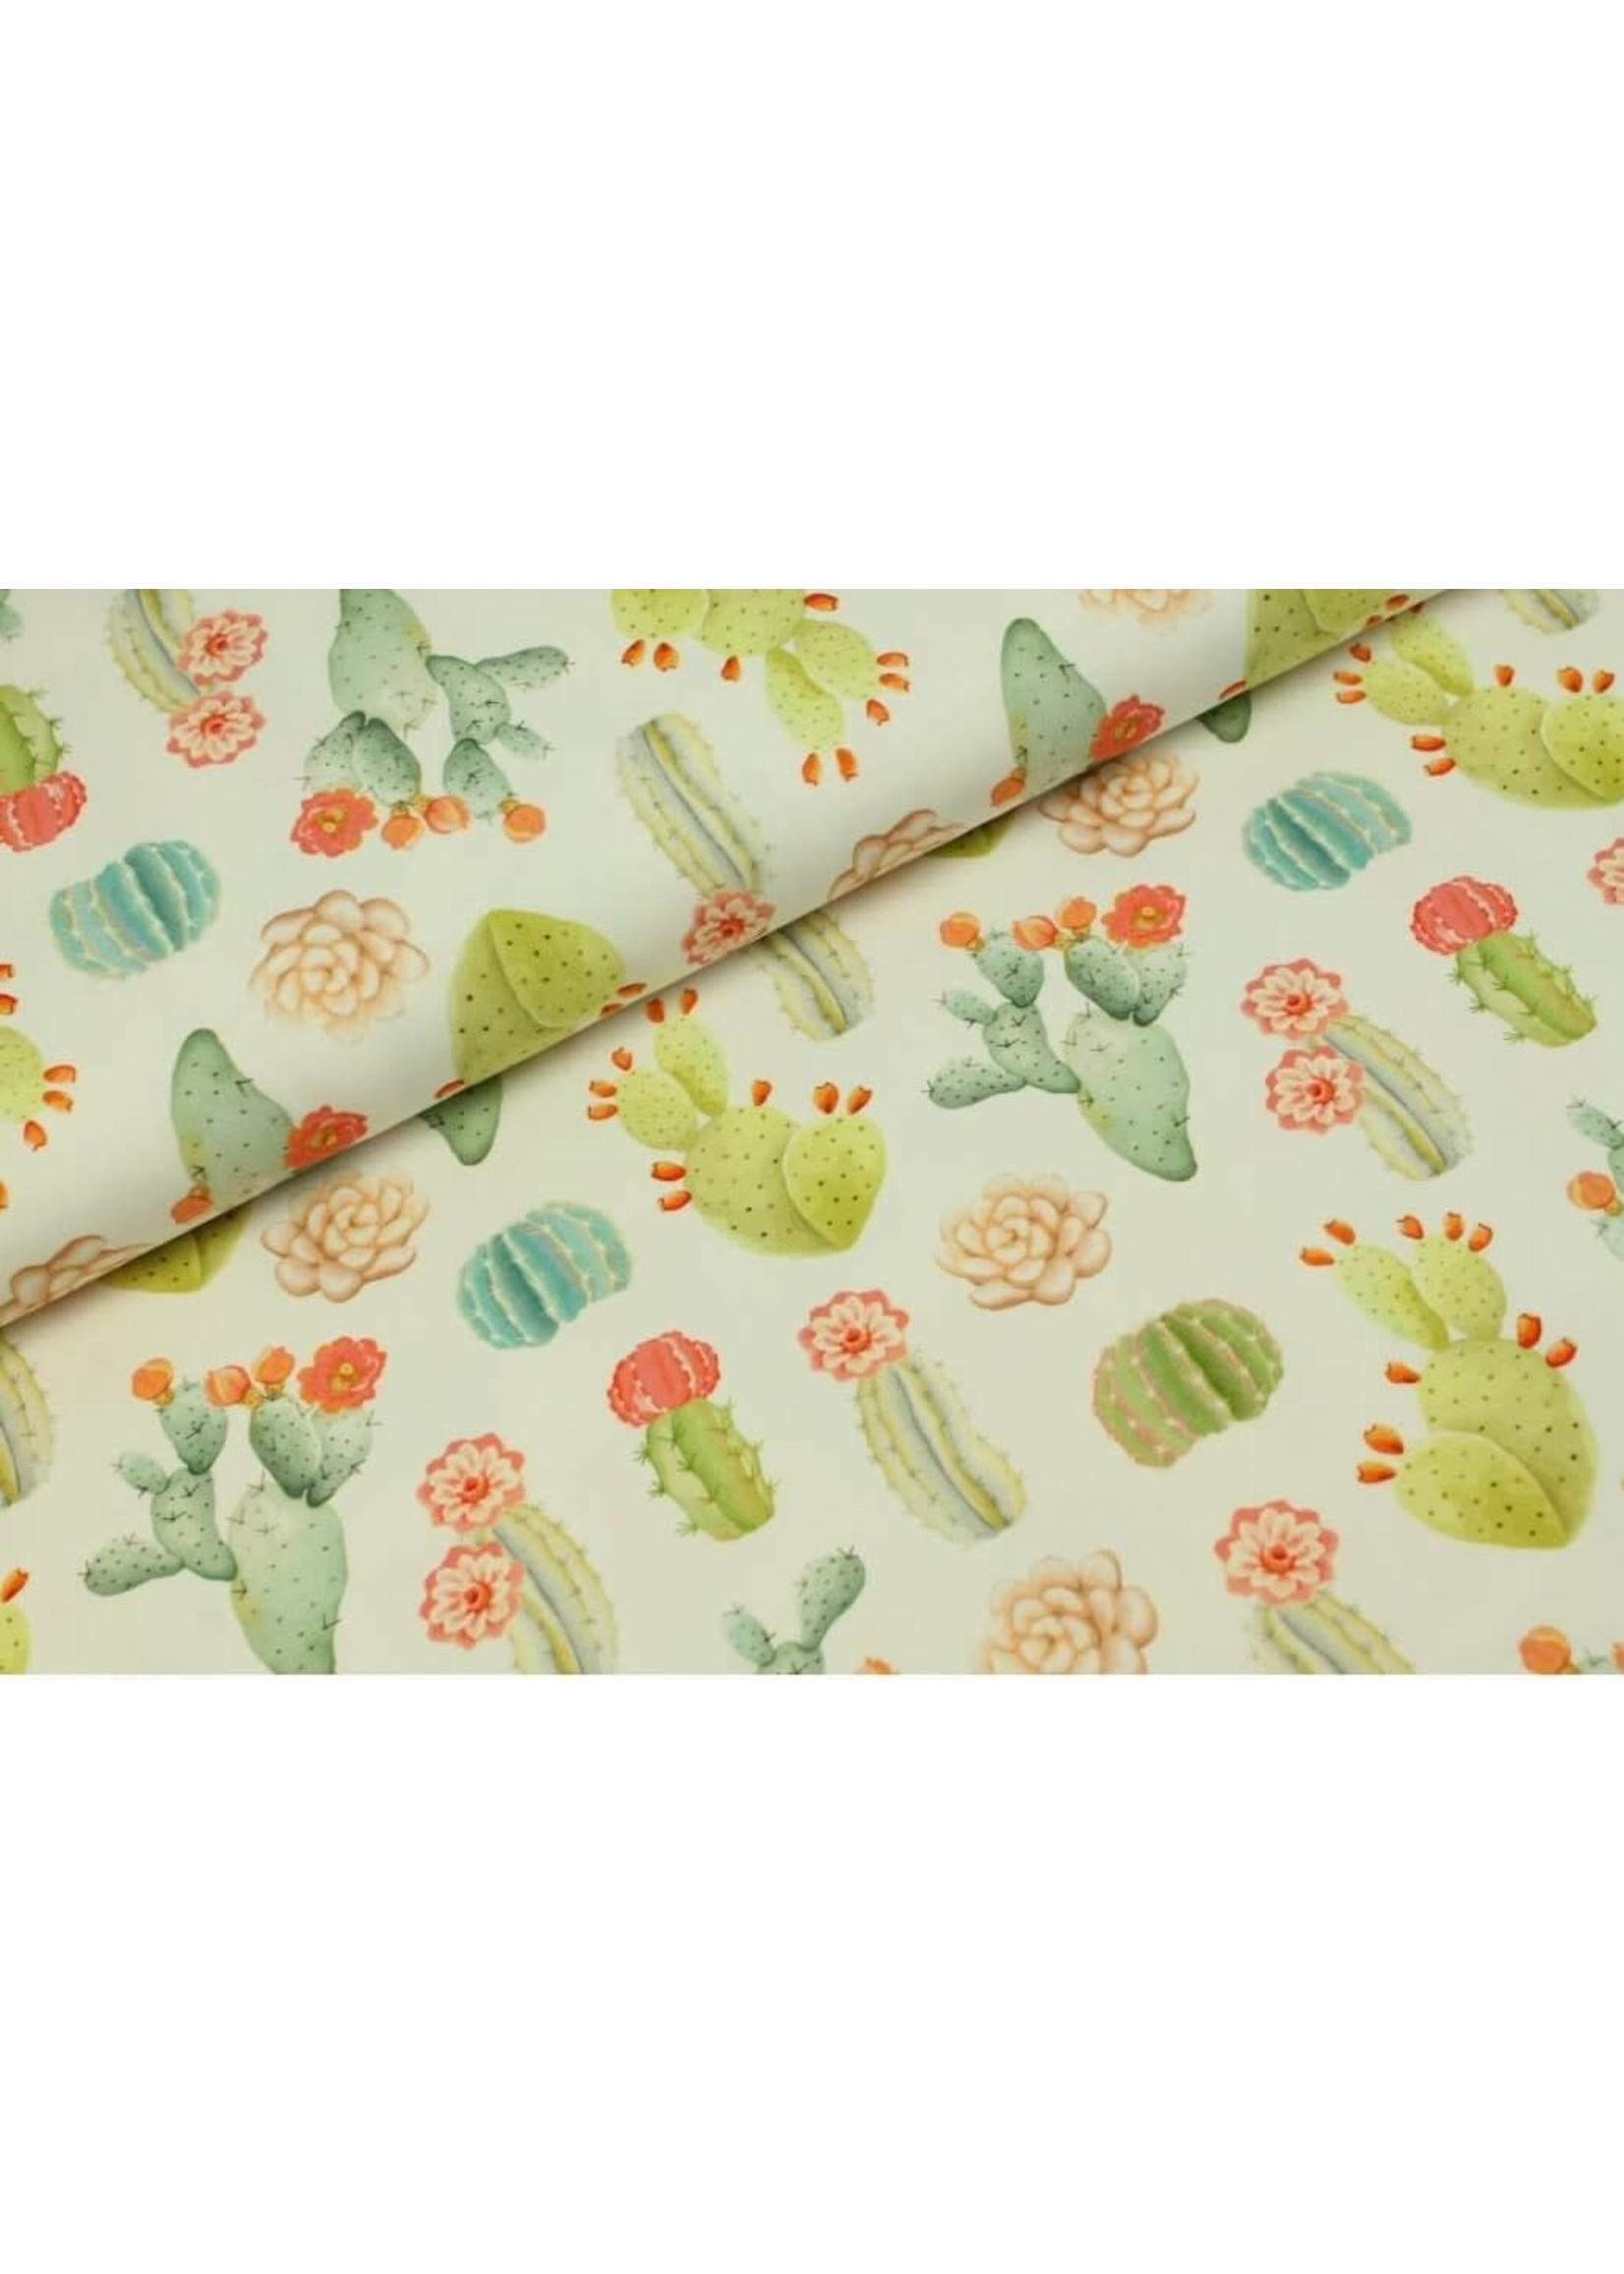 Megan Blue Fabrics Cactus fields wit